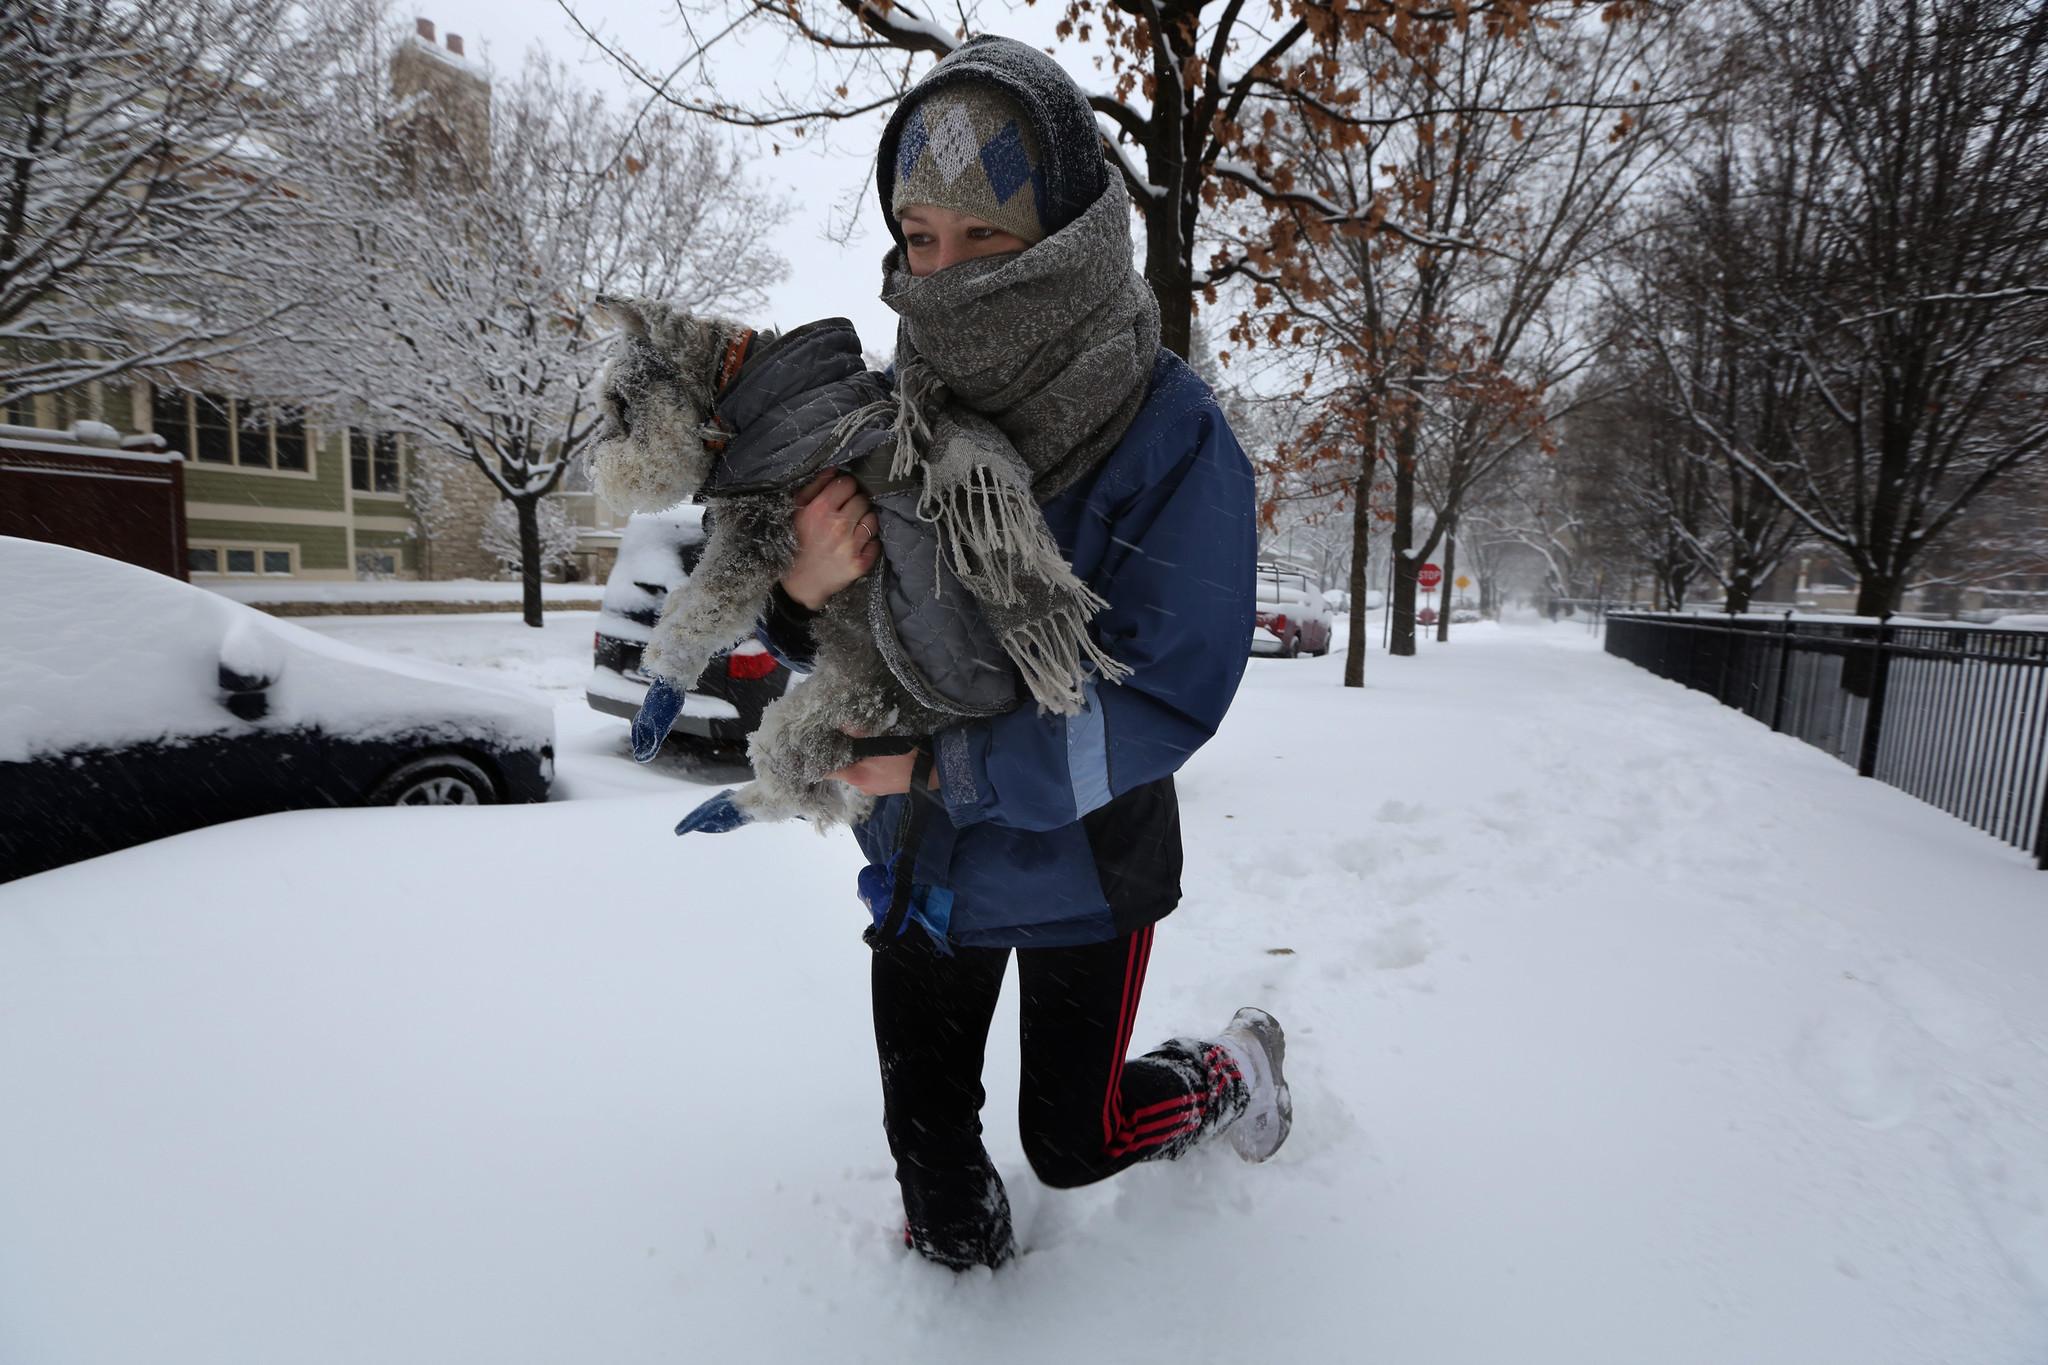 chicago weather - photo #48